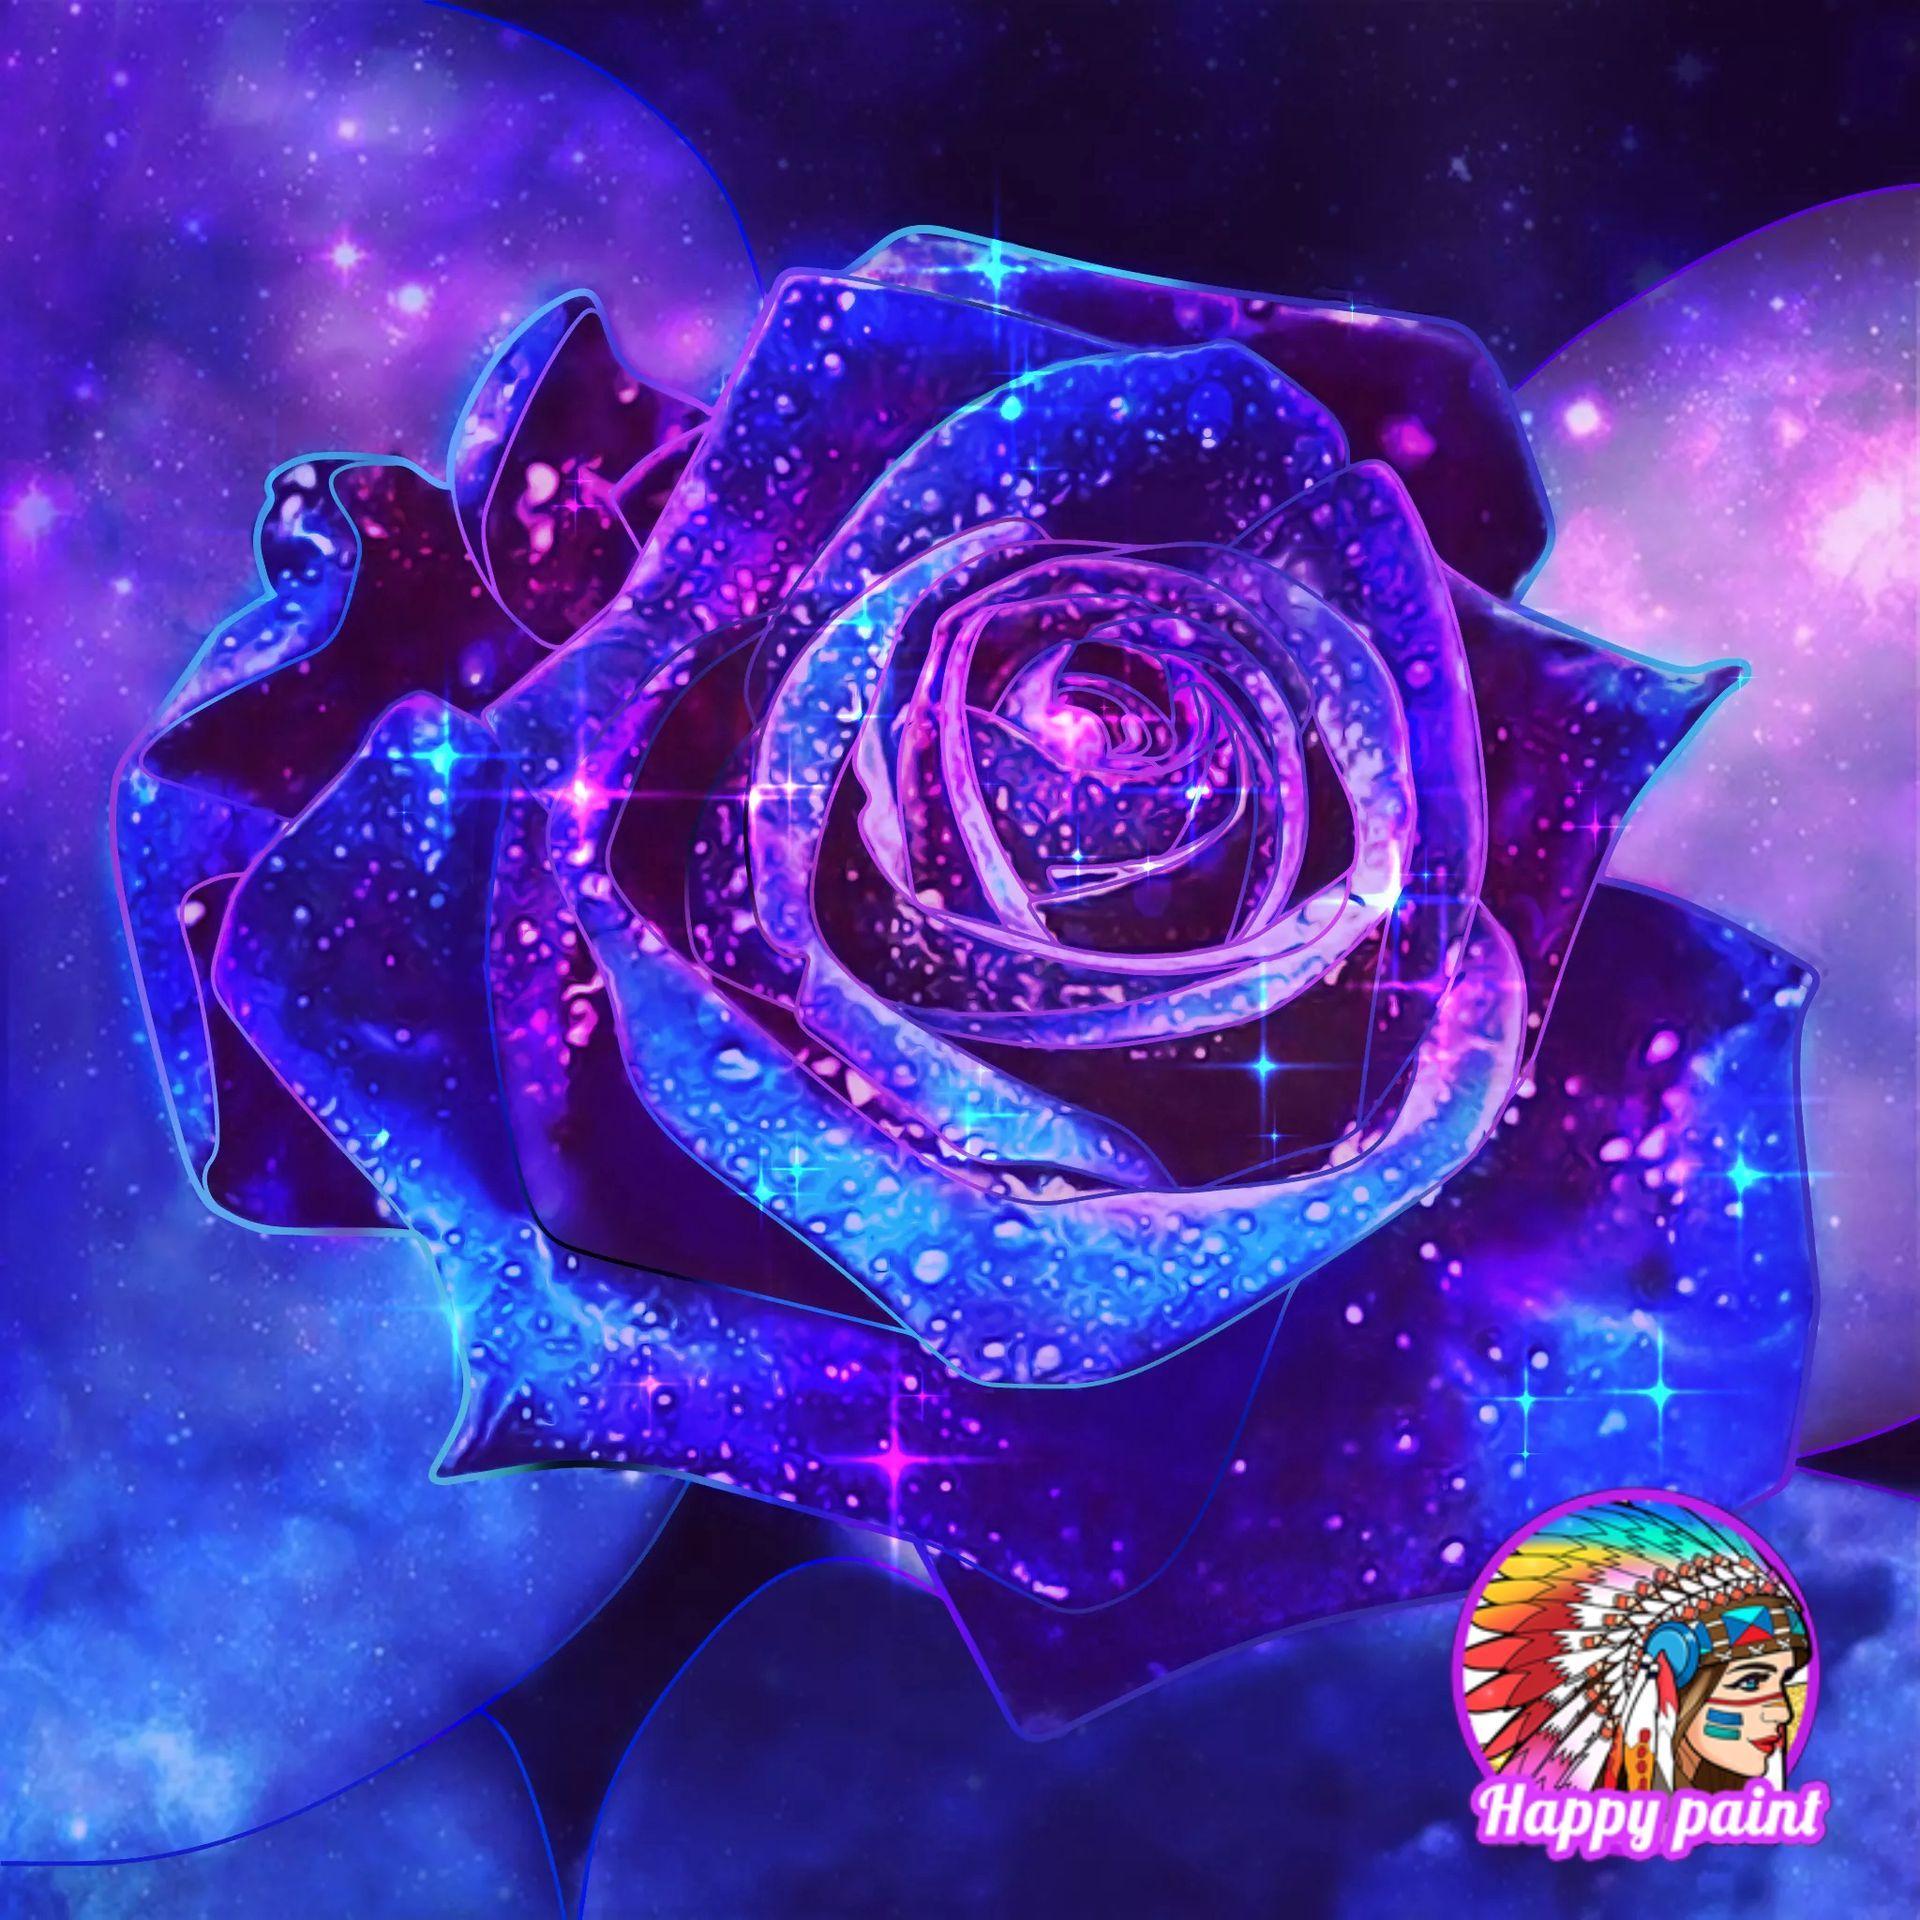 Cool Pics In 2021 Cute Galaxy Wallpaper Purple Wallpaper Iphone Anime Flower Coolest anime flower wallpaper